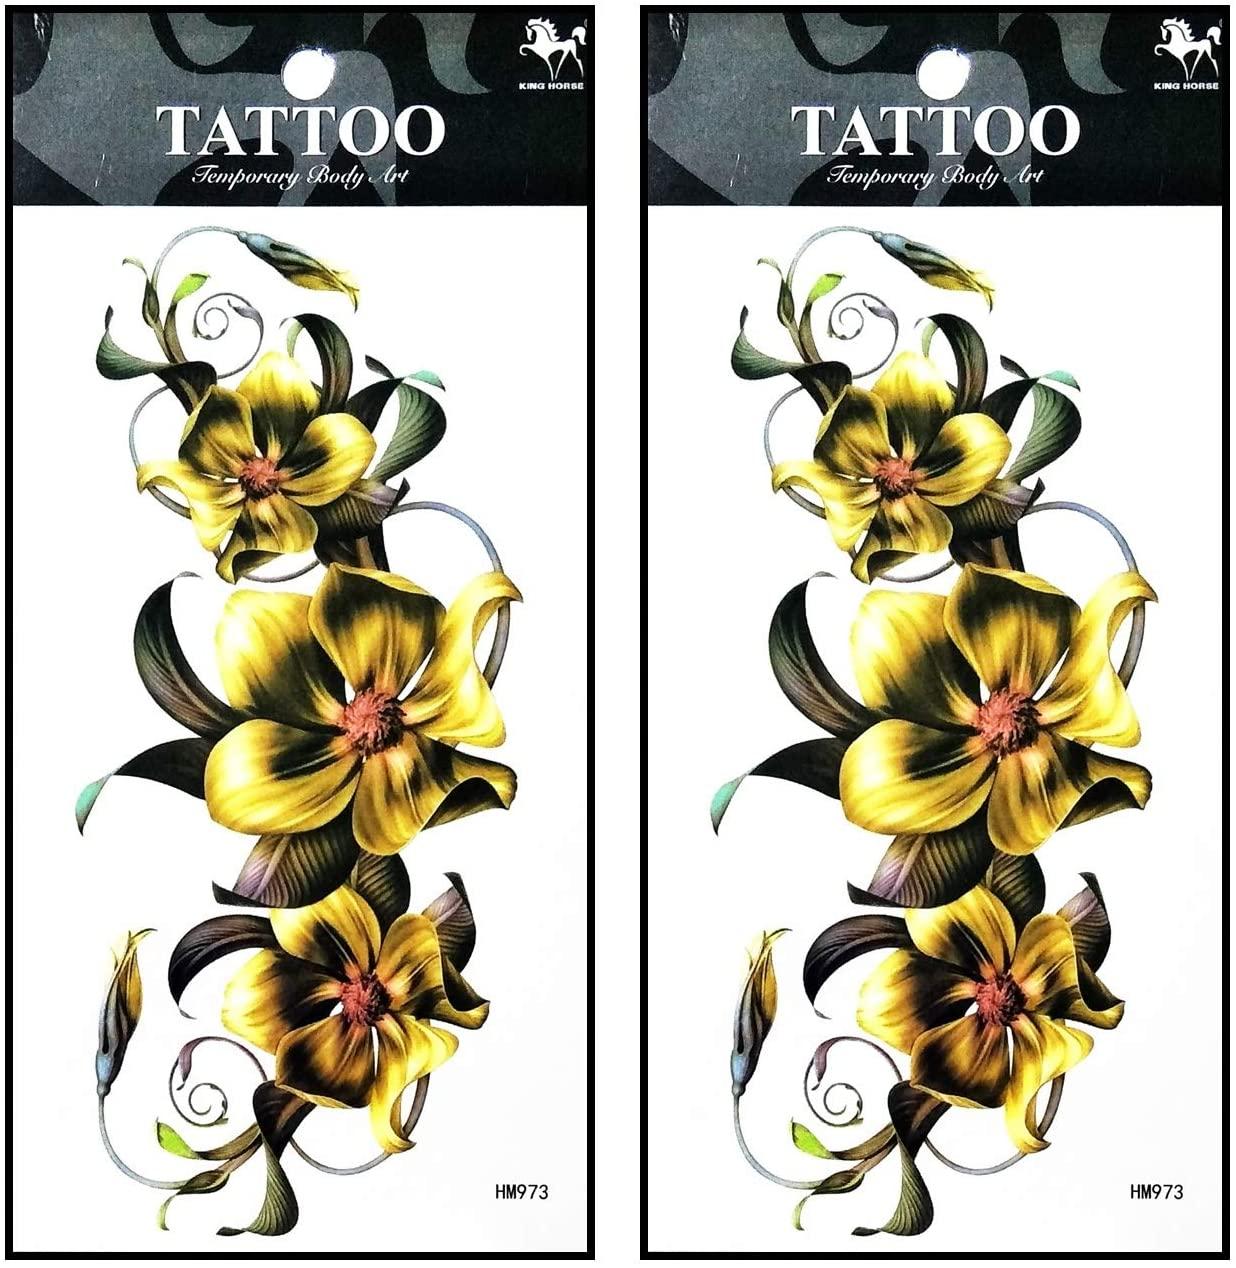 Tattoos 2 Sheets Gold Wild Orchid Sunflower Temporary Tattoos for Adult Men Women Kids Waterproof Temporary Tattoo Fake Tattoos Body Art Sticker for Kid Teens Men Women